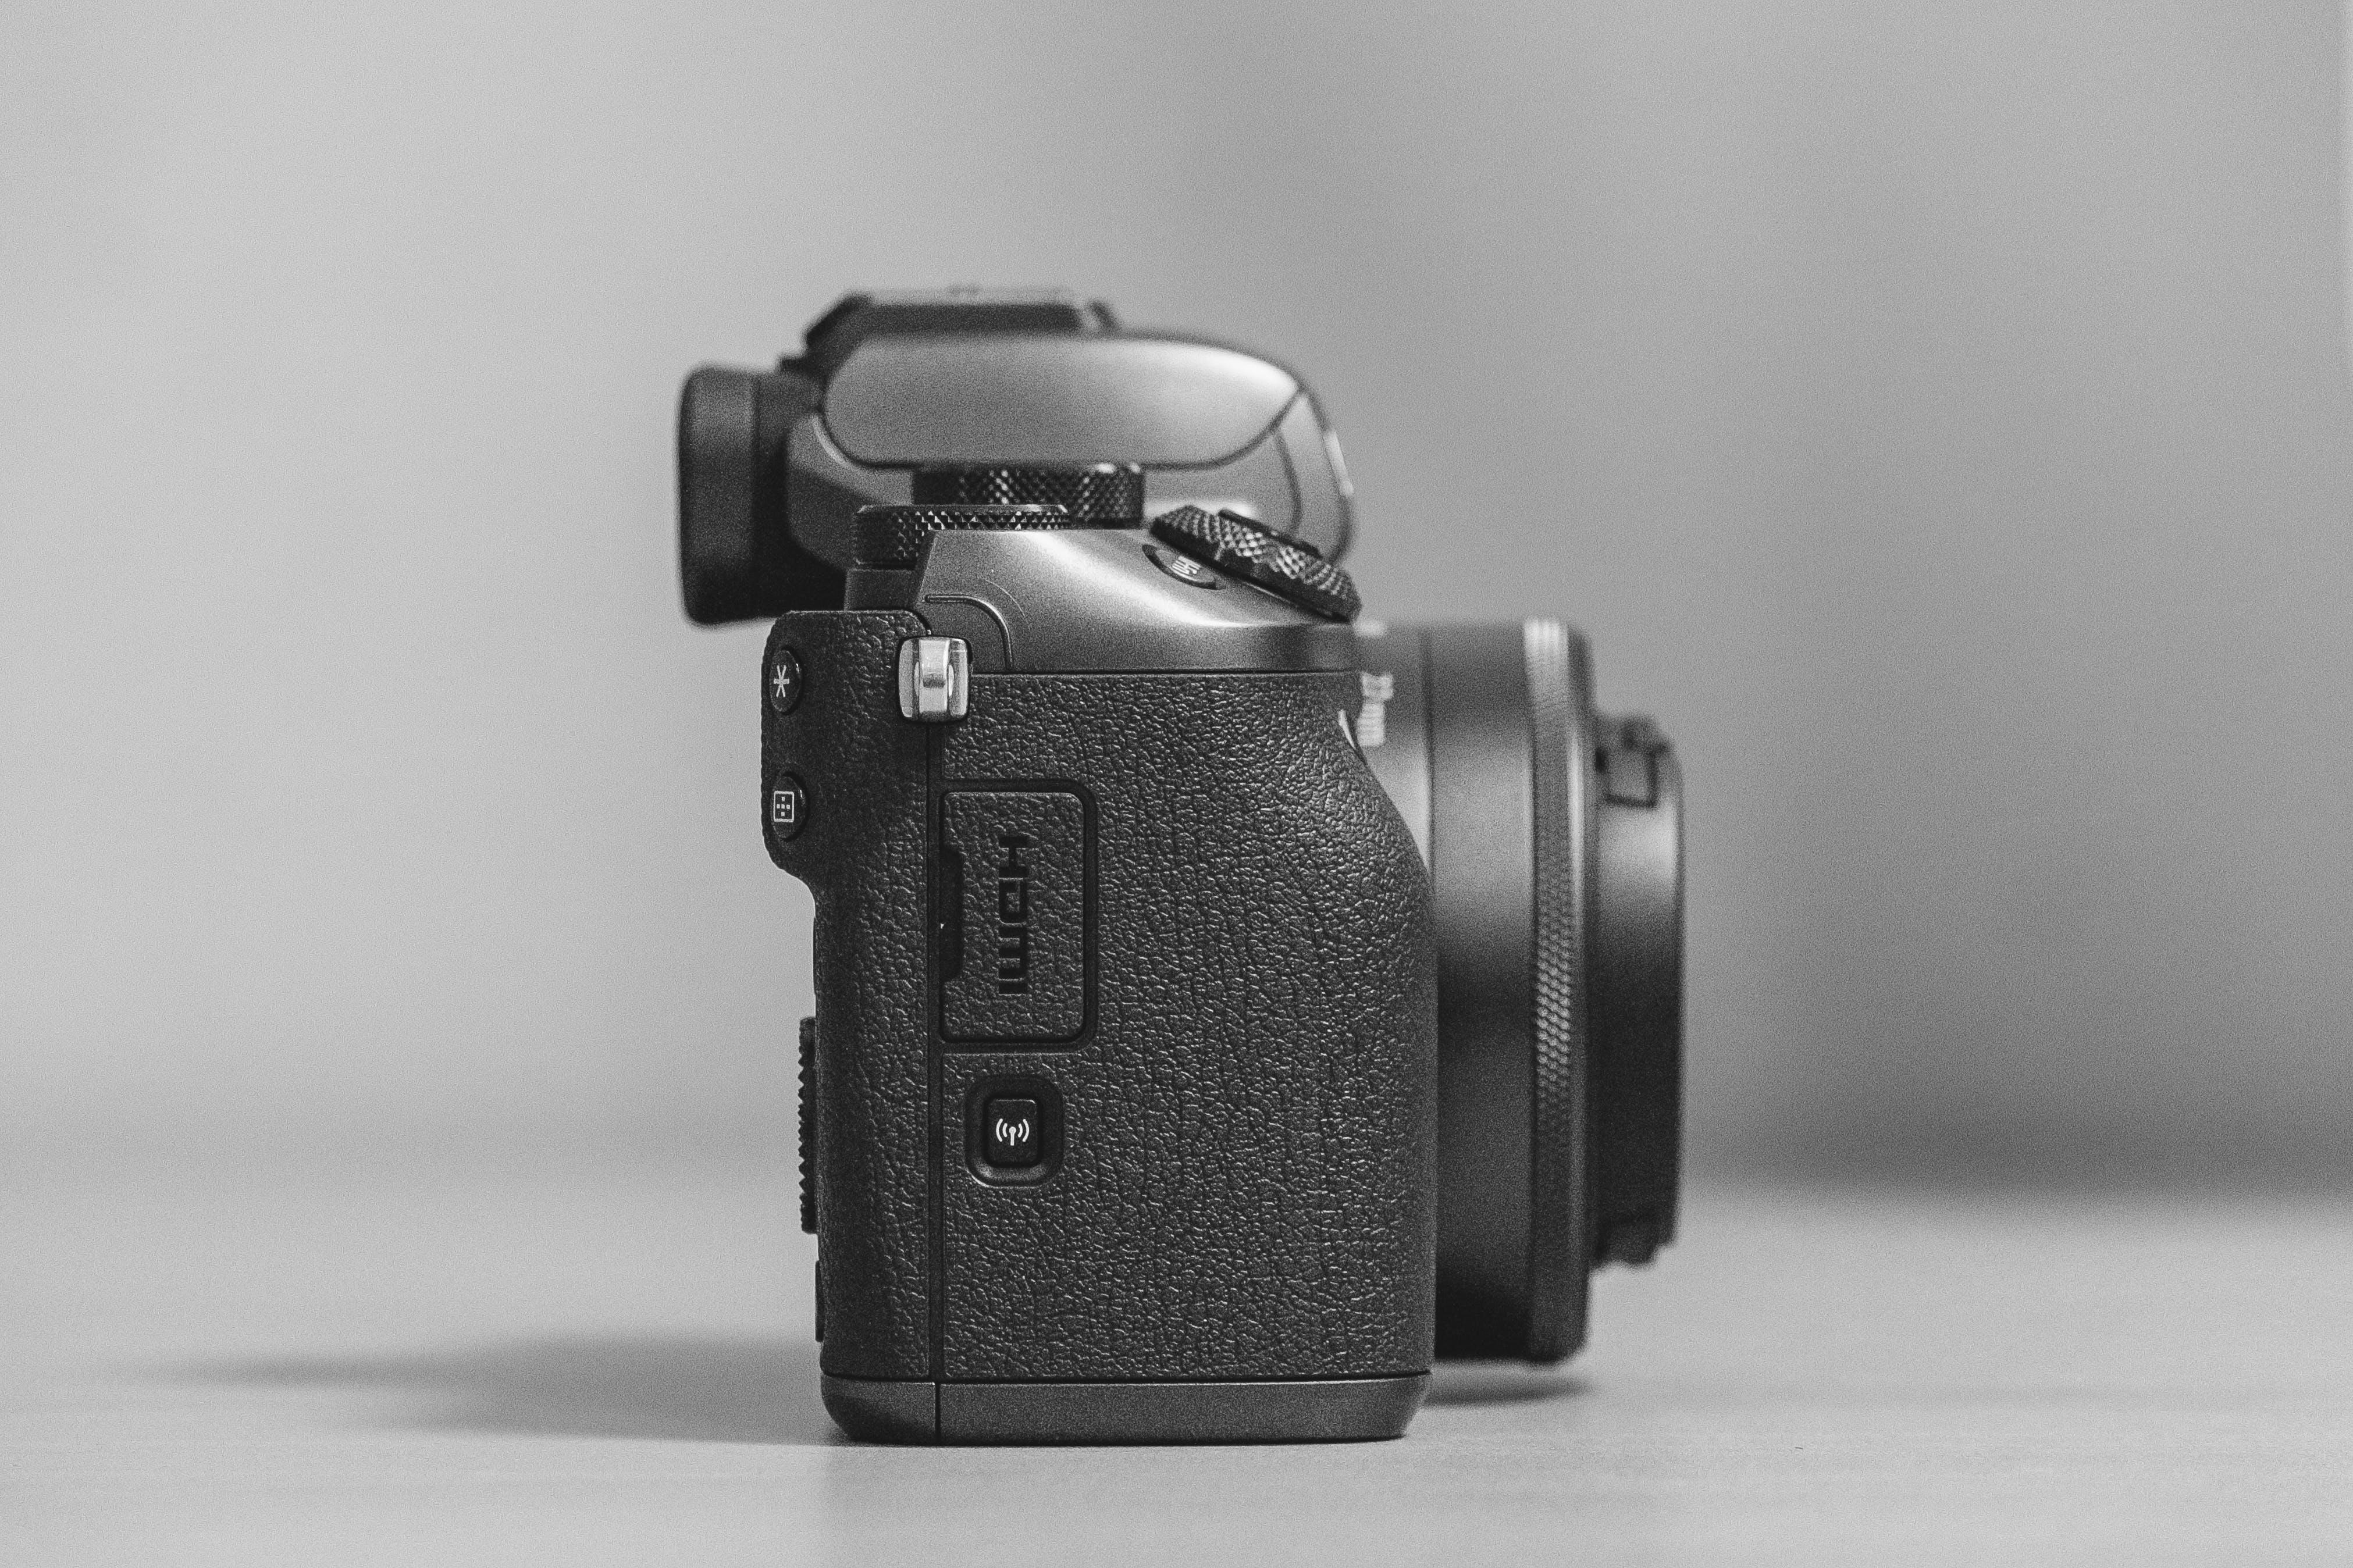 Kostenloses Stock Foto zu digitalkamera, dslr-kamera, fotografie, kamera